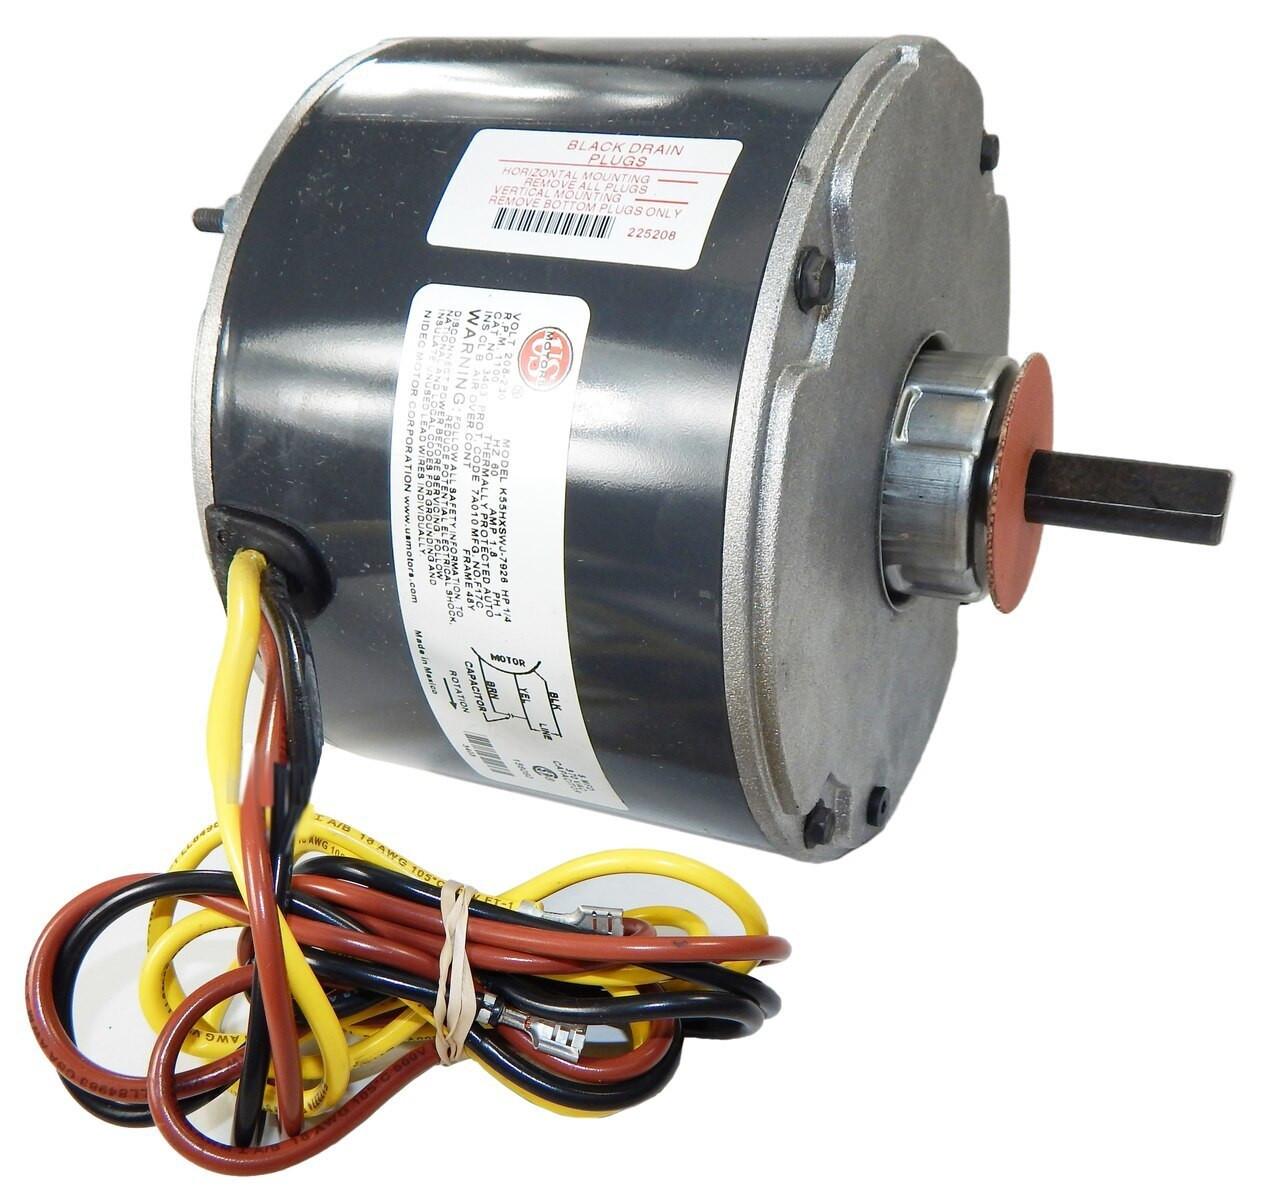 York Source One 3//4 HP STD ECM Blower Motor 1050 RPM to 1400 RPM 208-230 V max